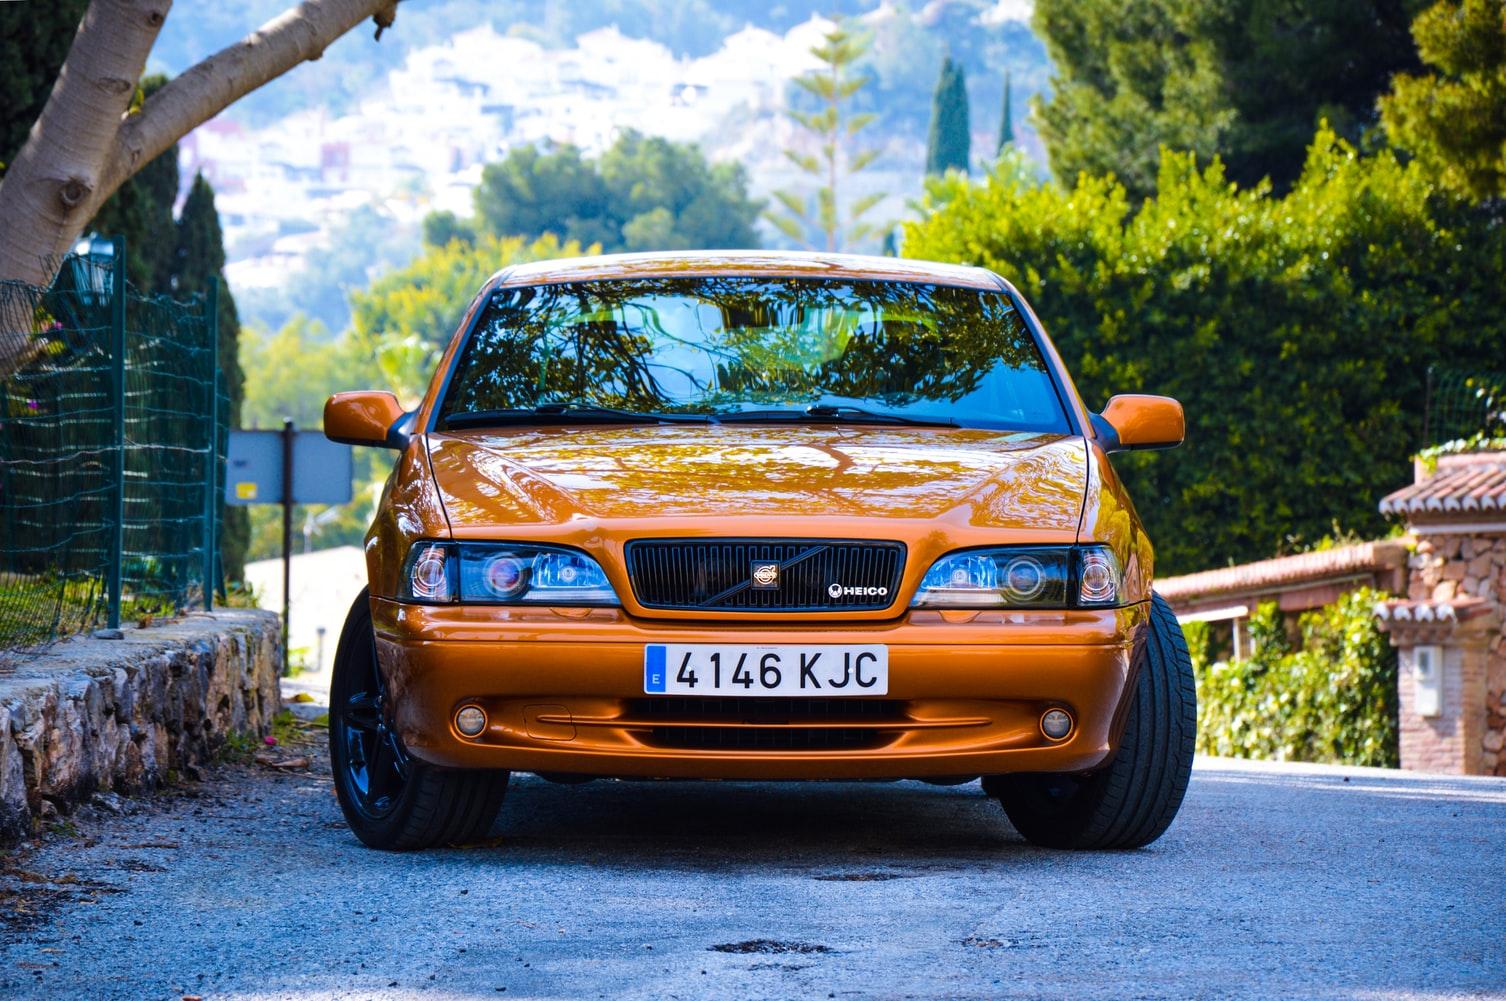 Volvo 70 C70 Coupe 1997 ManuelMena Unsplashphoto photo-1574935359723-0271f1f0dd26